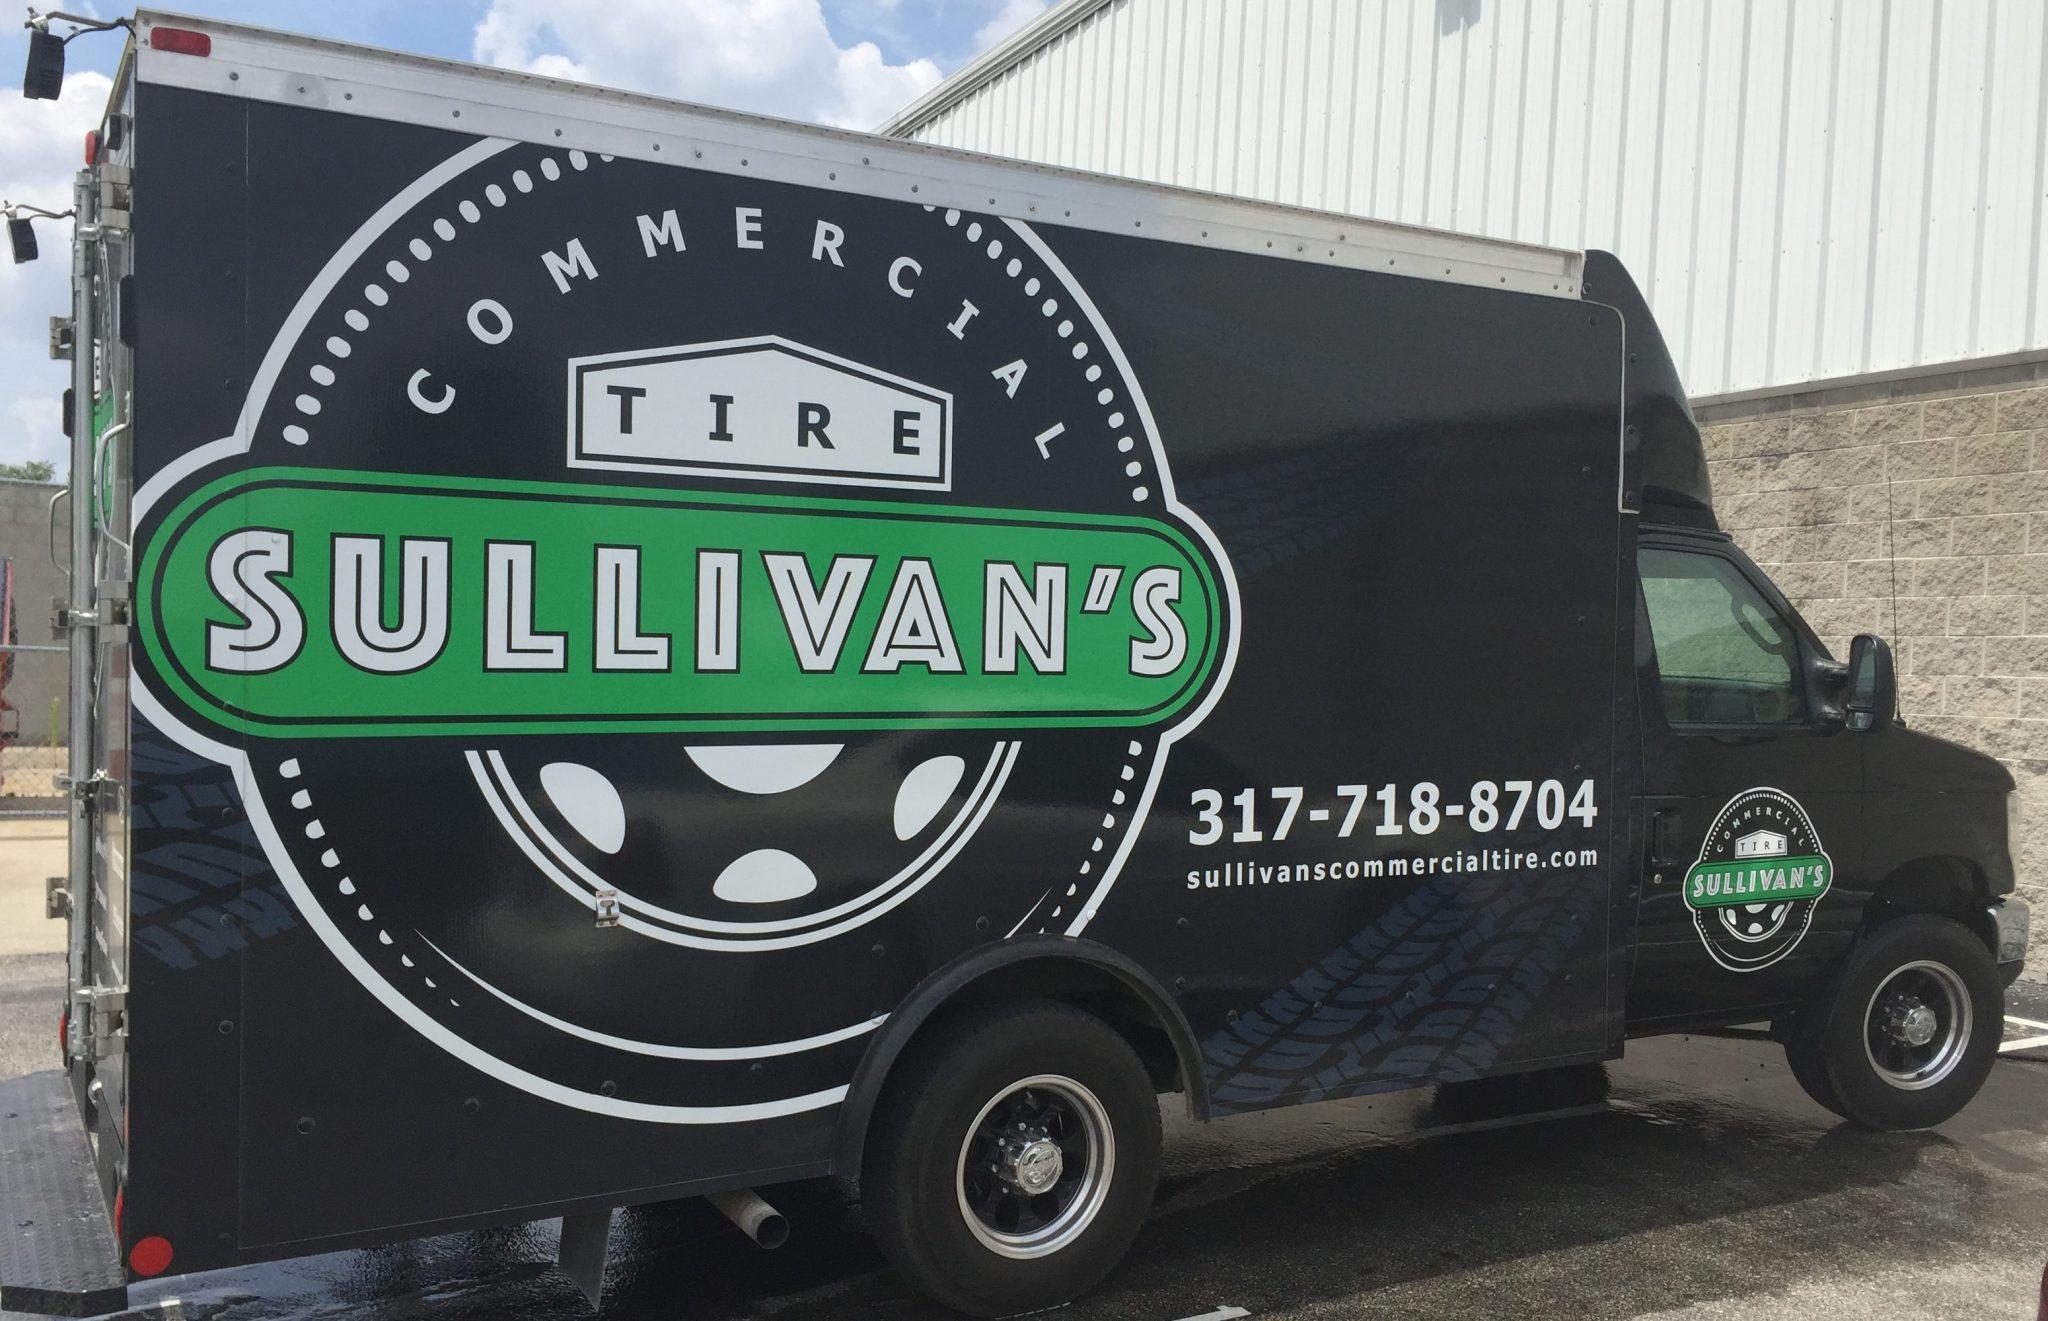 Sullivan's Commercial Tire